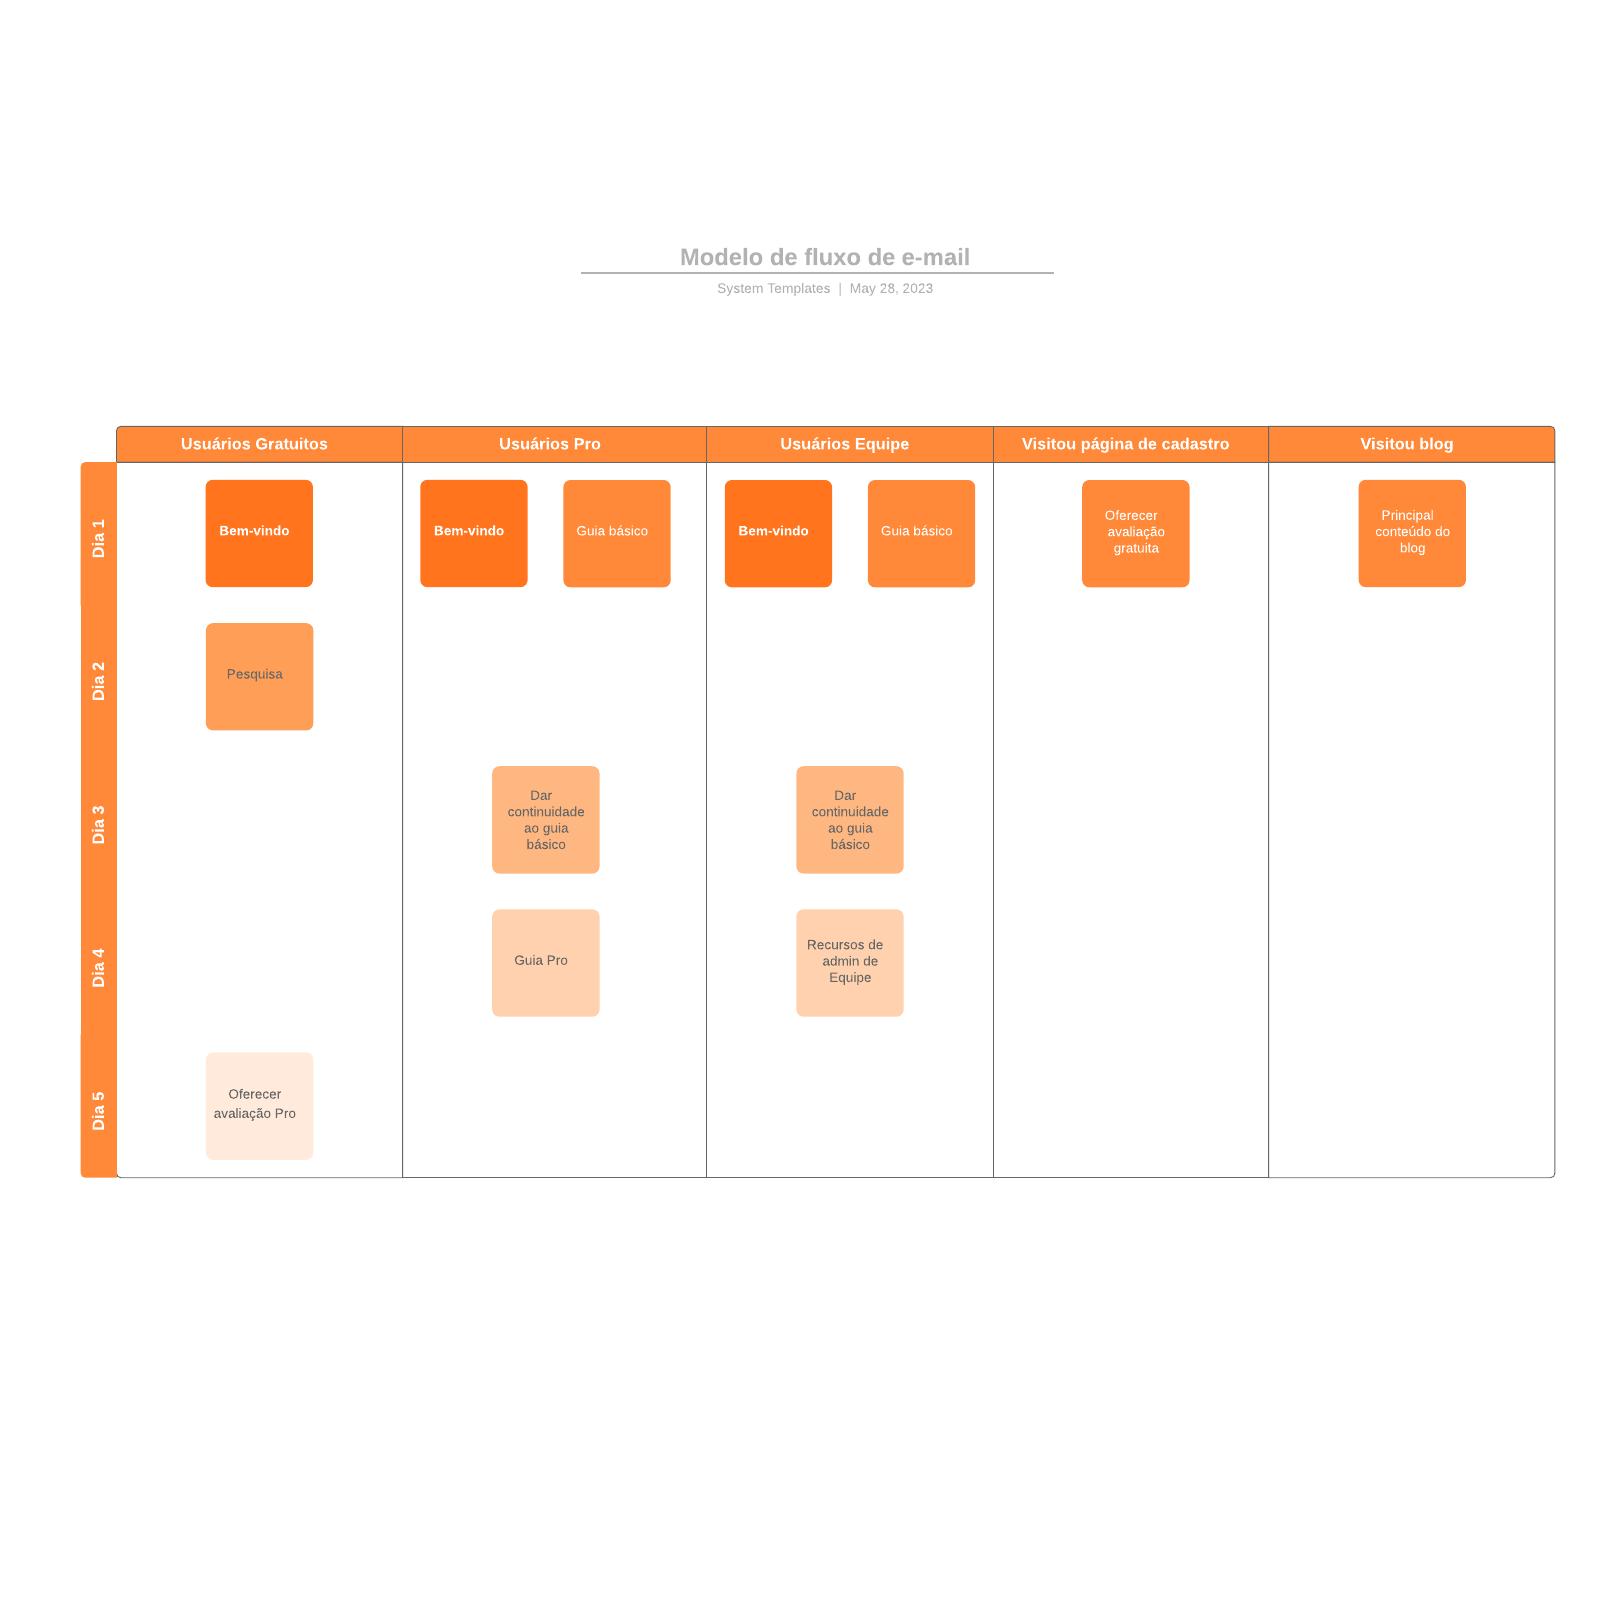 Modelo de fluxo de e-mail